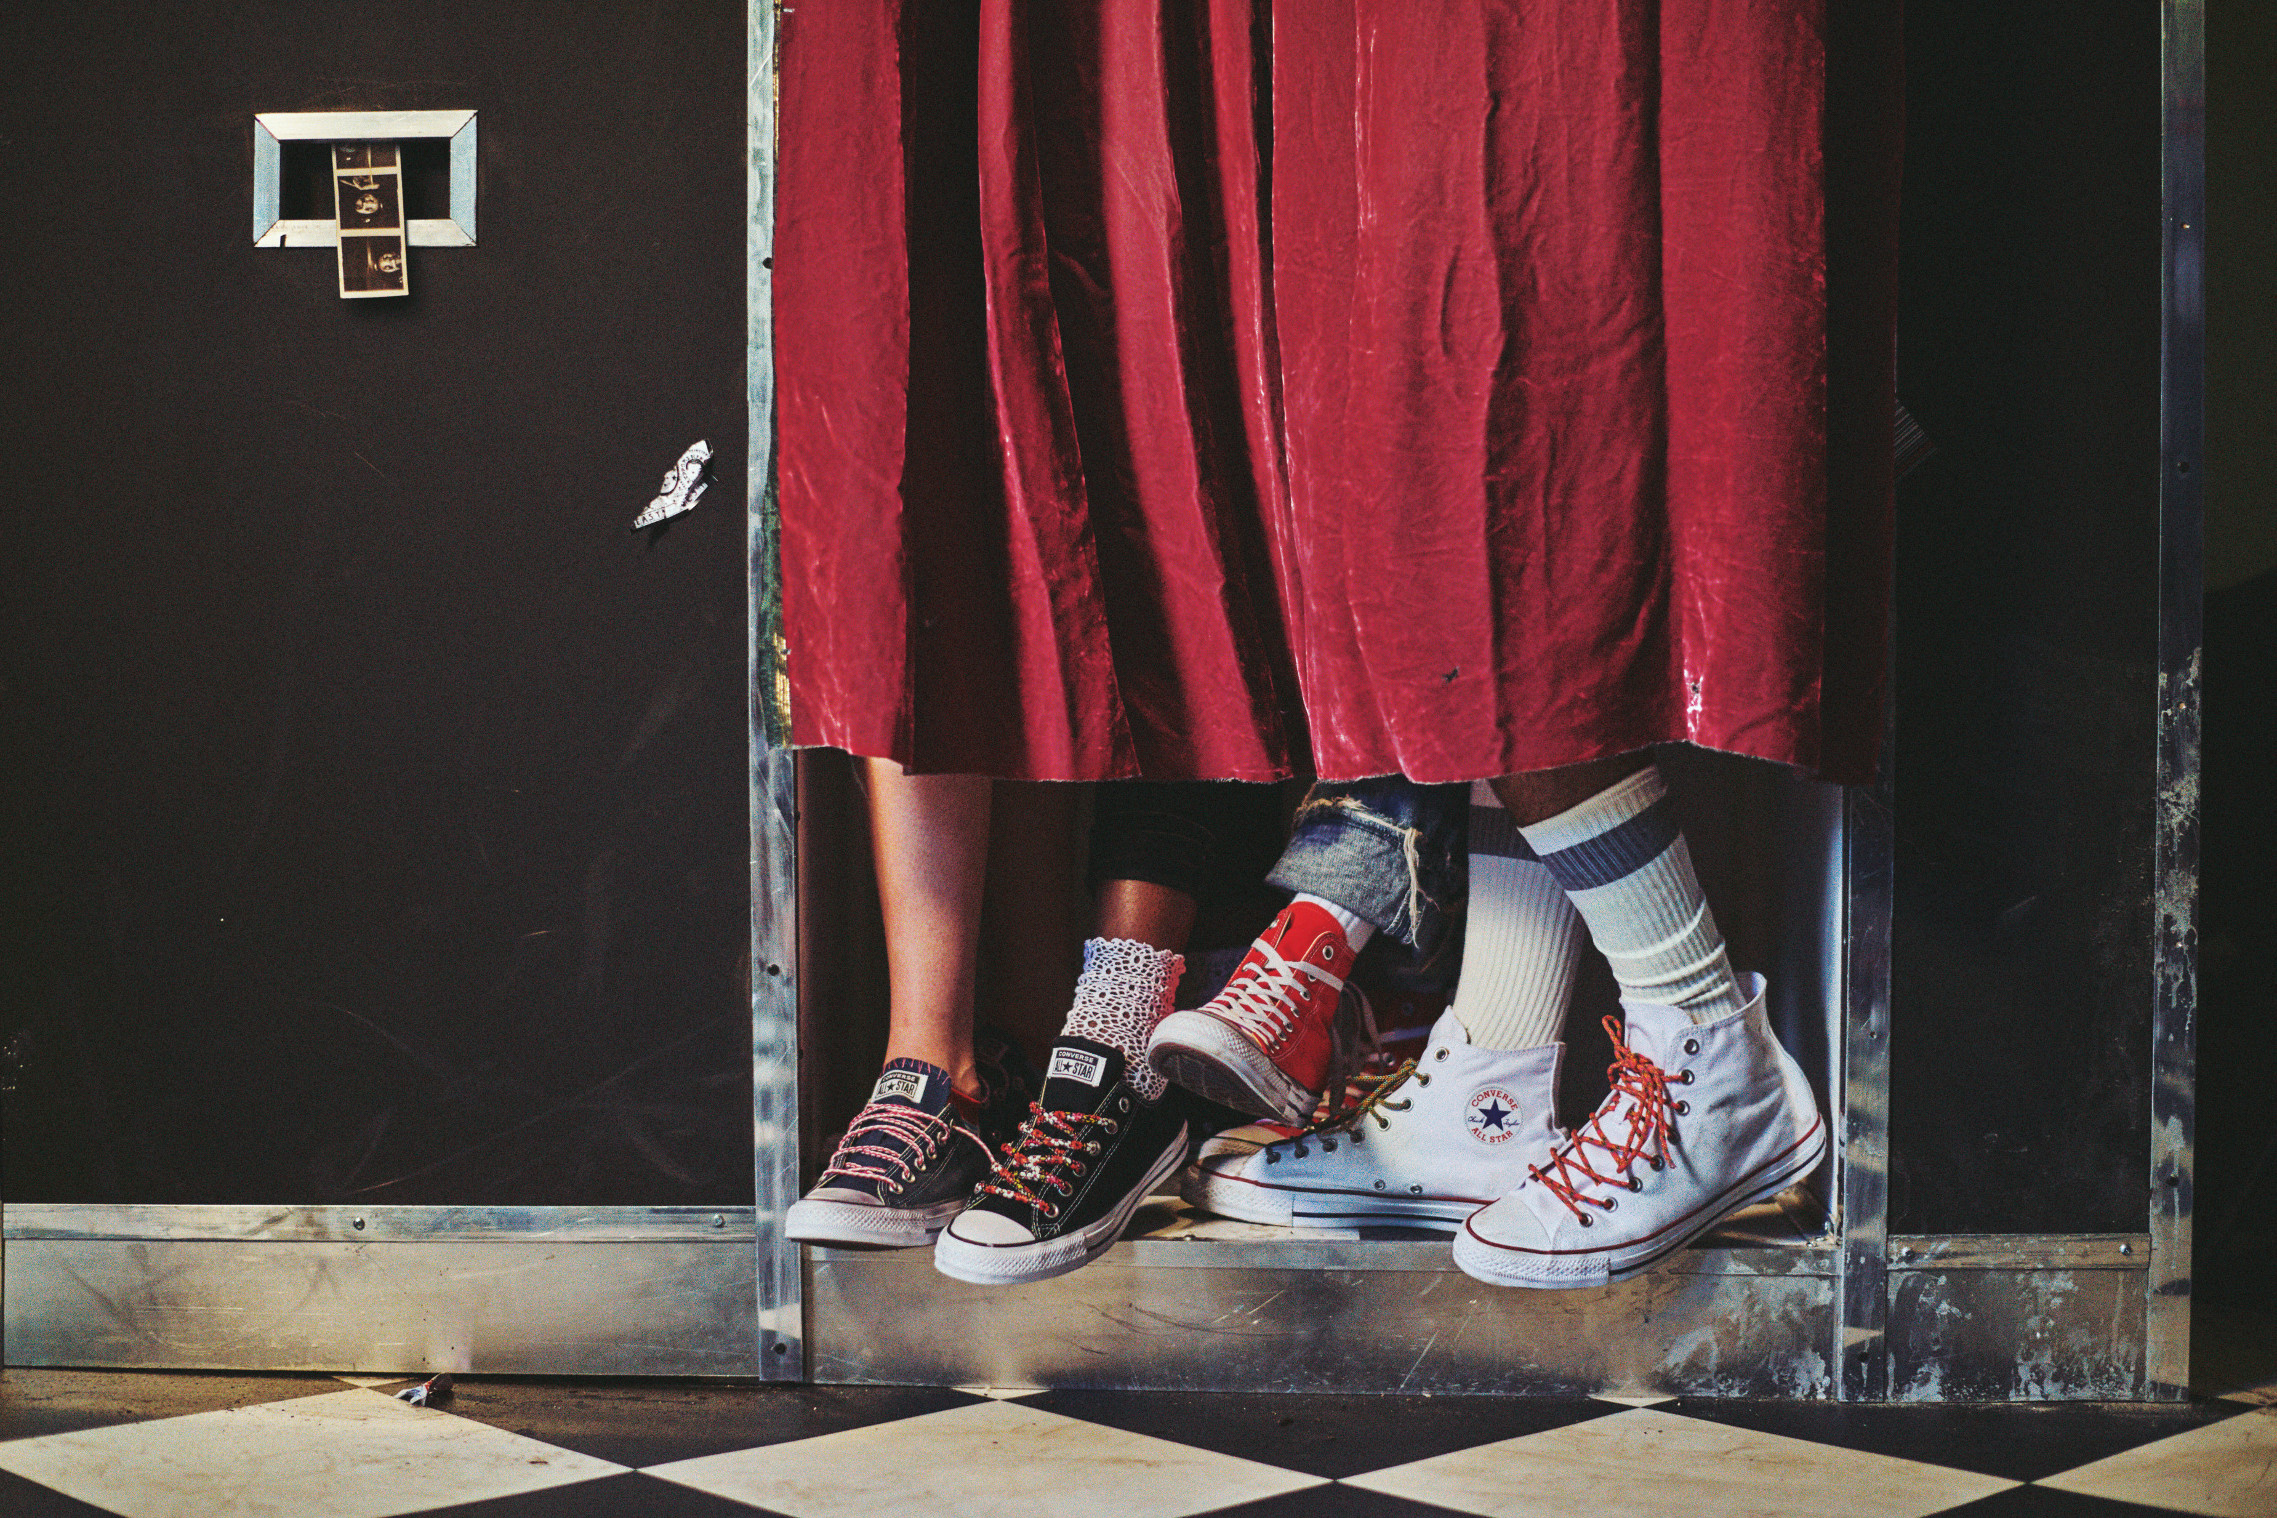 Converse opowiada historie osób noszących model Chuck Taylor!